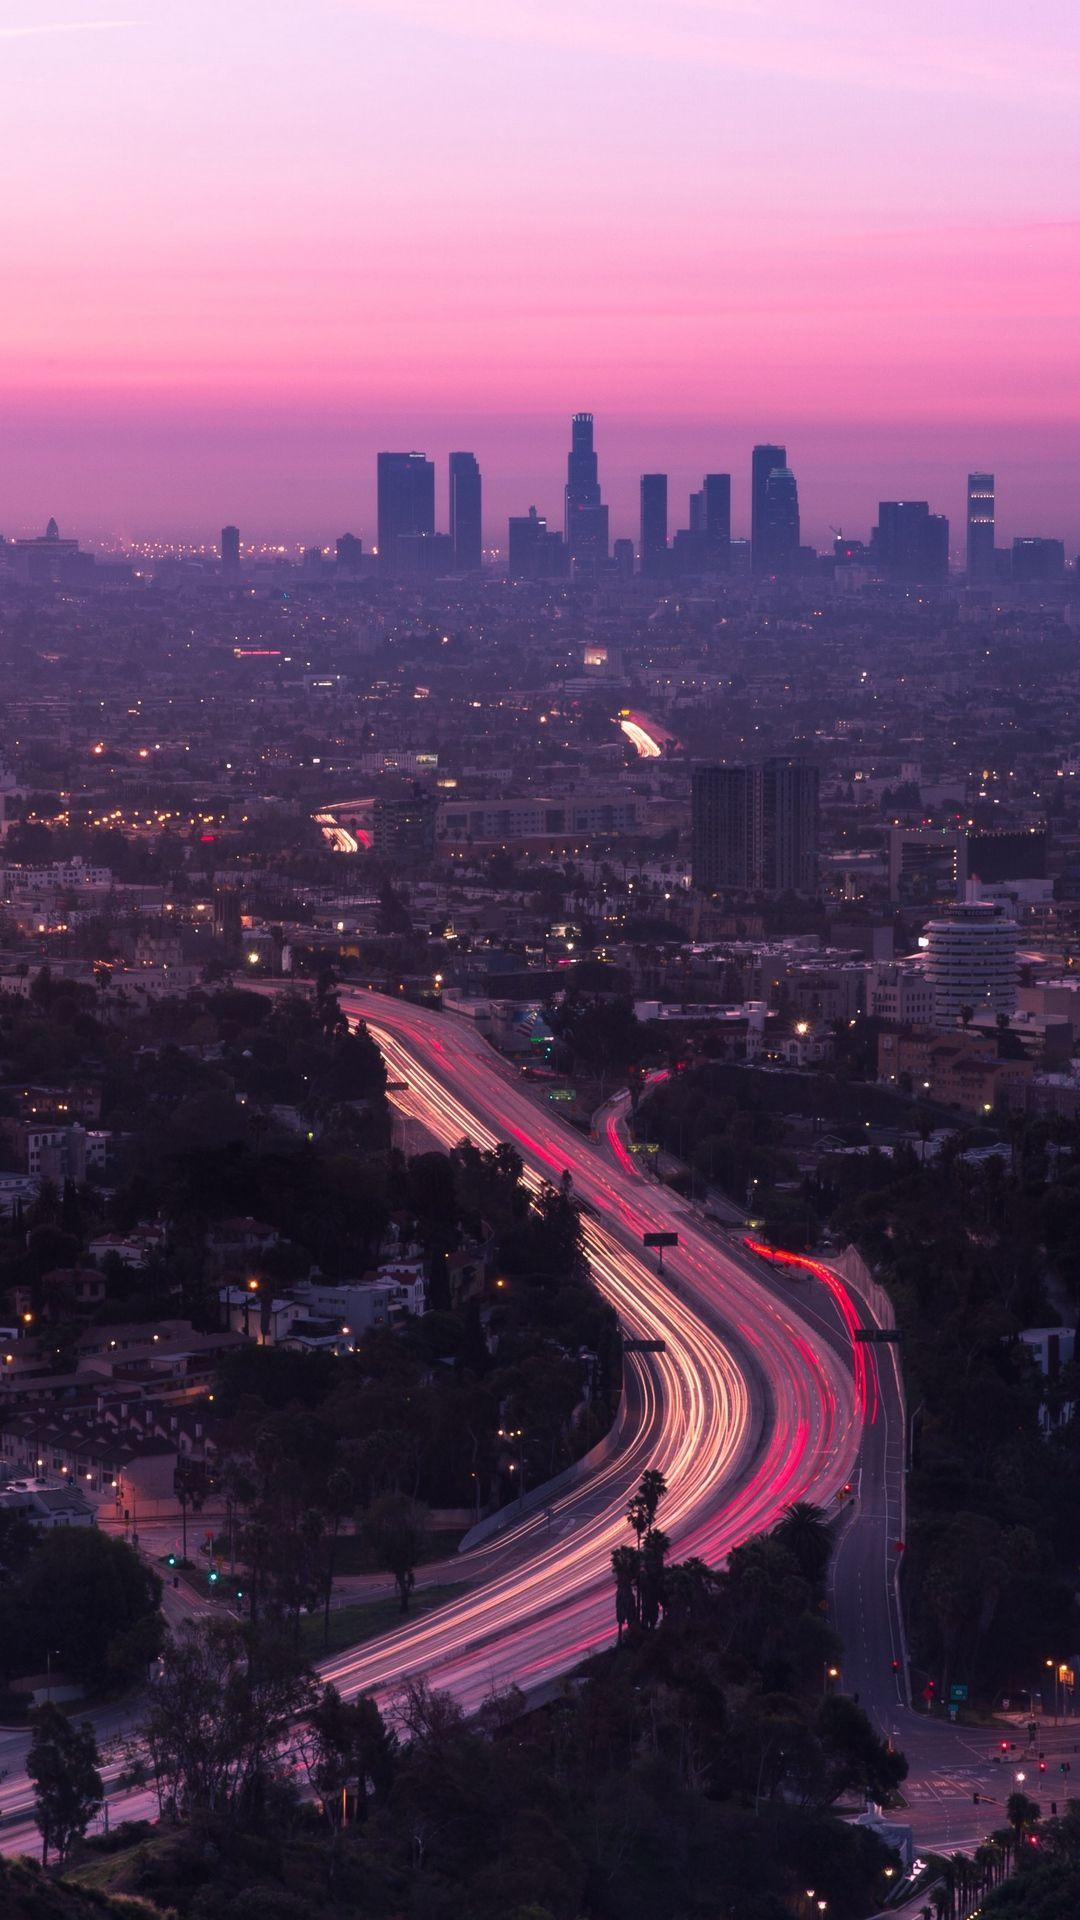 Man Made / Los Angeles (1080x1920) Mobile Wallpaper (Có